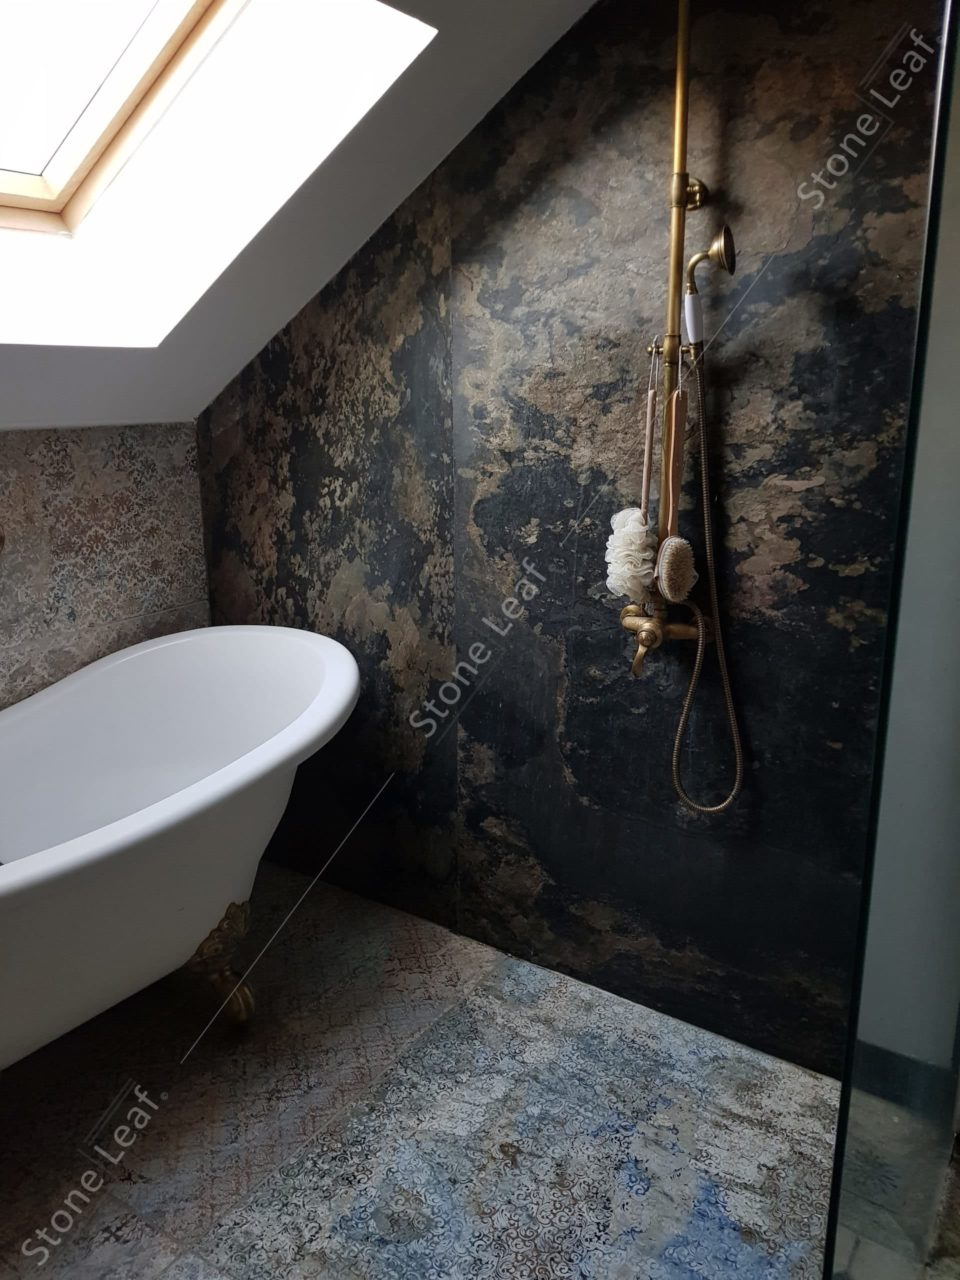 Feuille de pierre 100% naturelle en mur de salle de bain